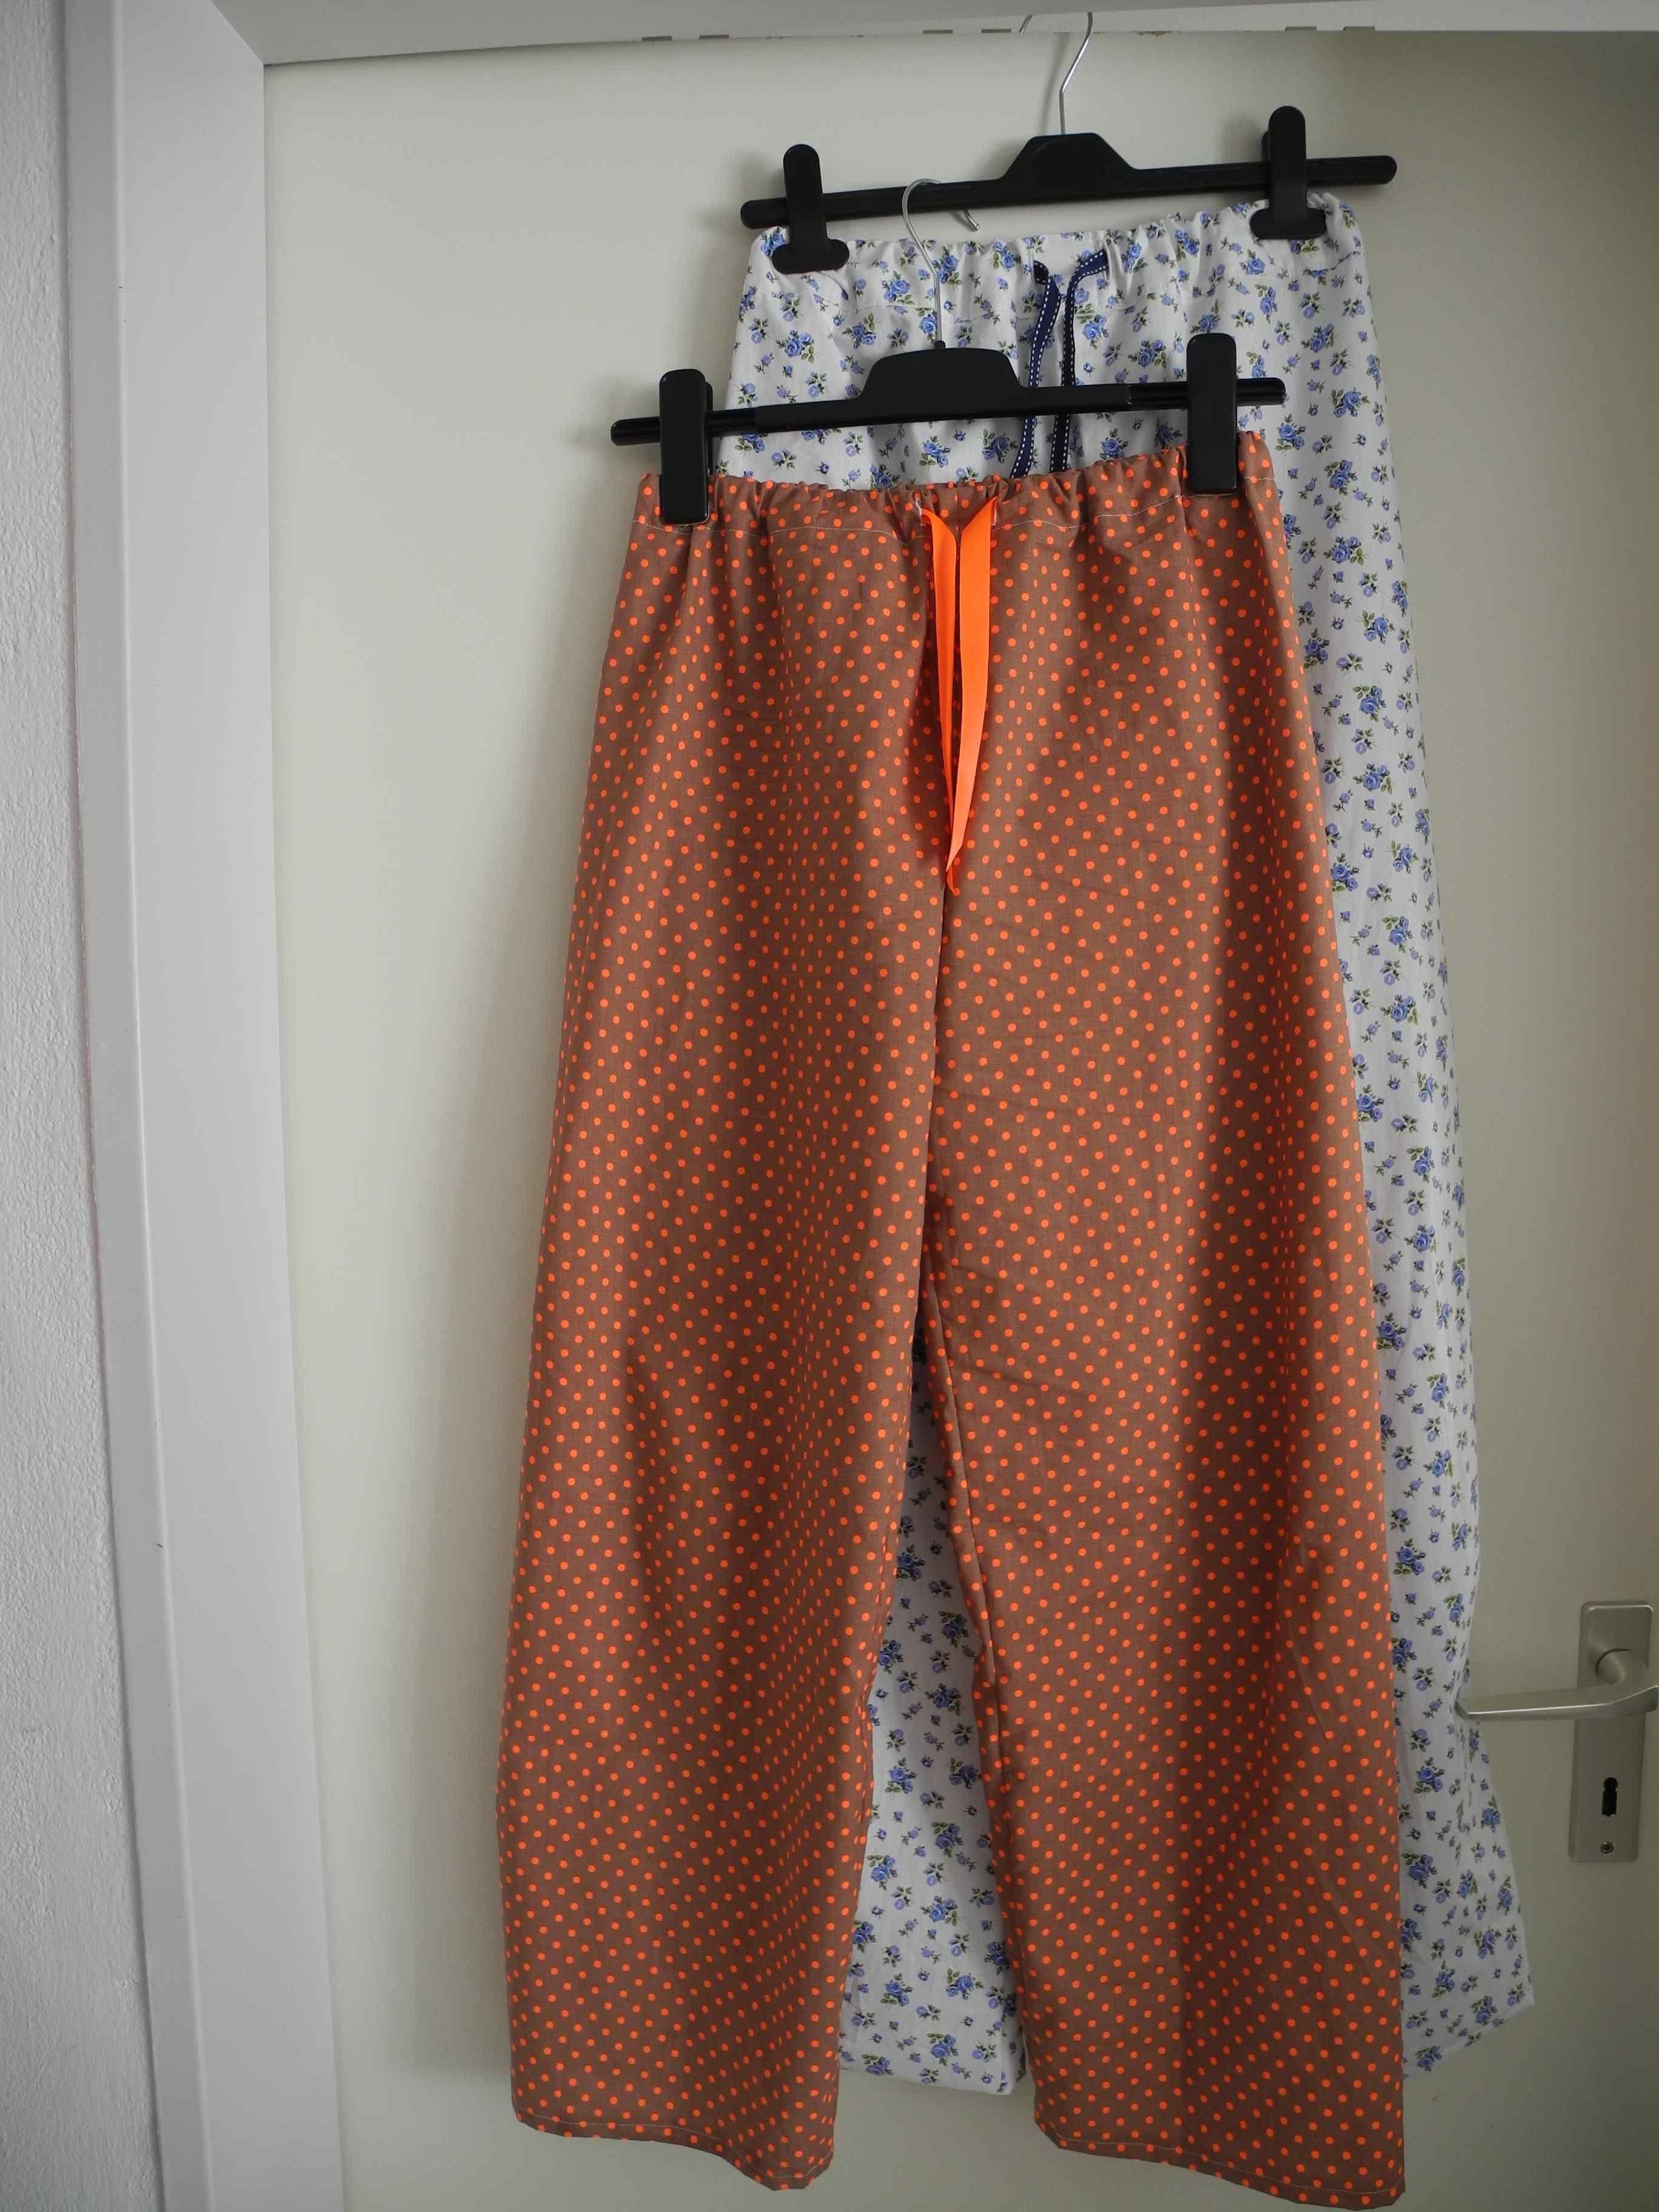 53ff74122a Easy Pyjamahose! Anleitung inklusive Schnittmuster | Lapika Blog